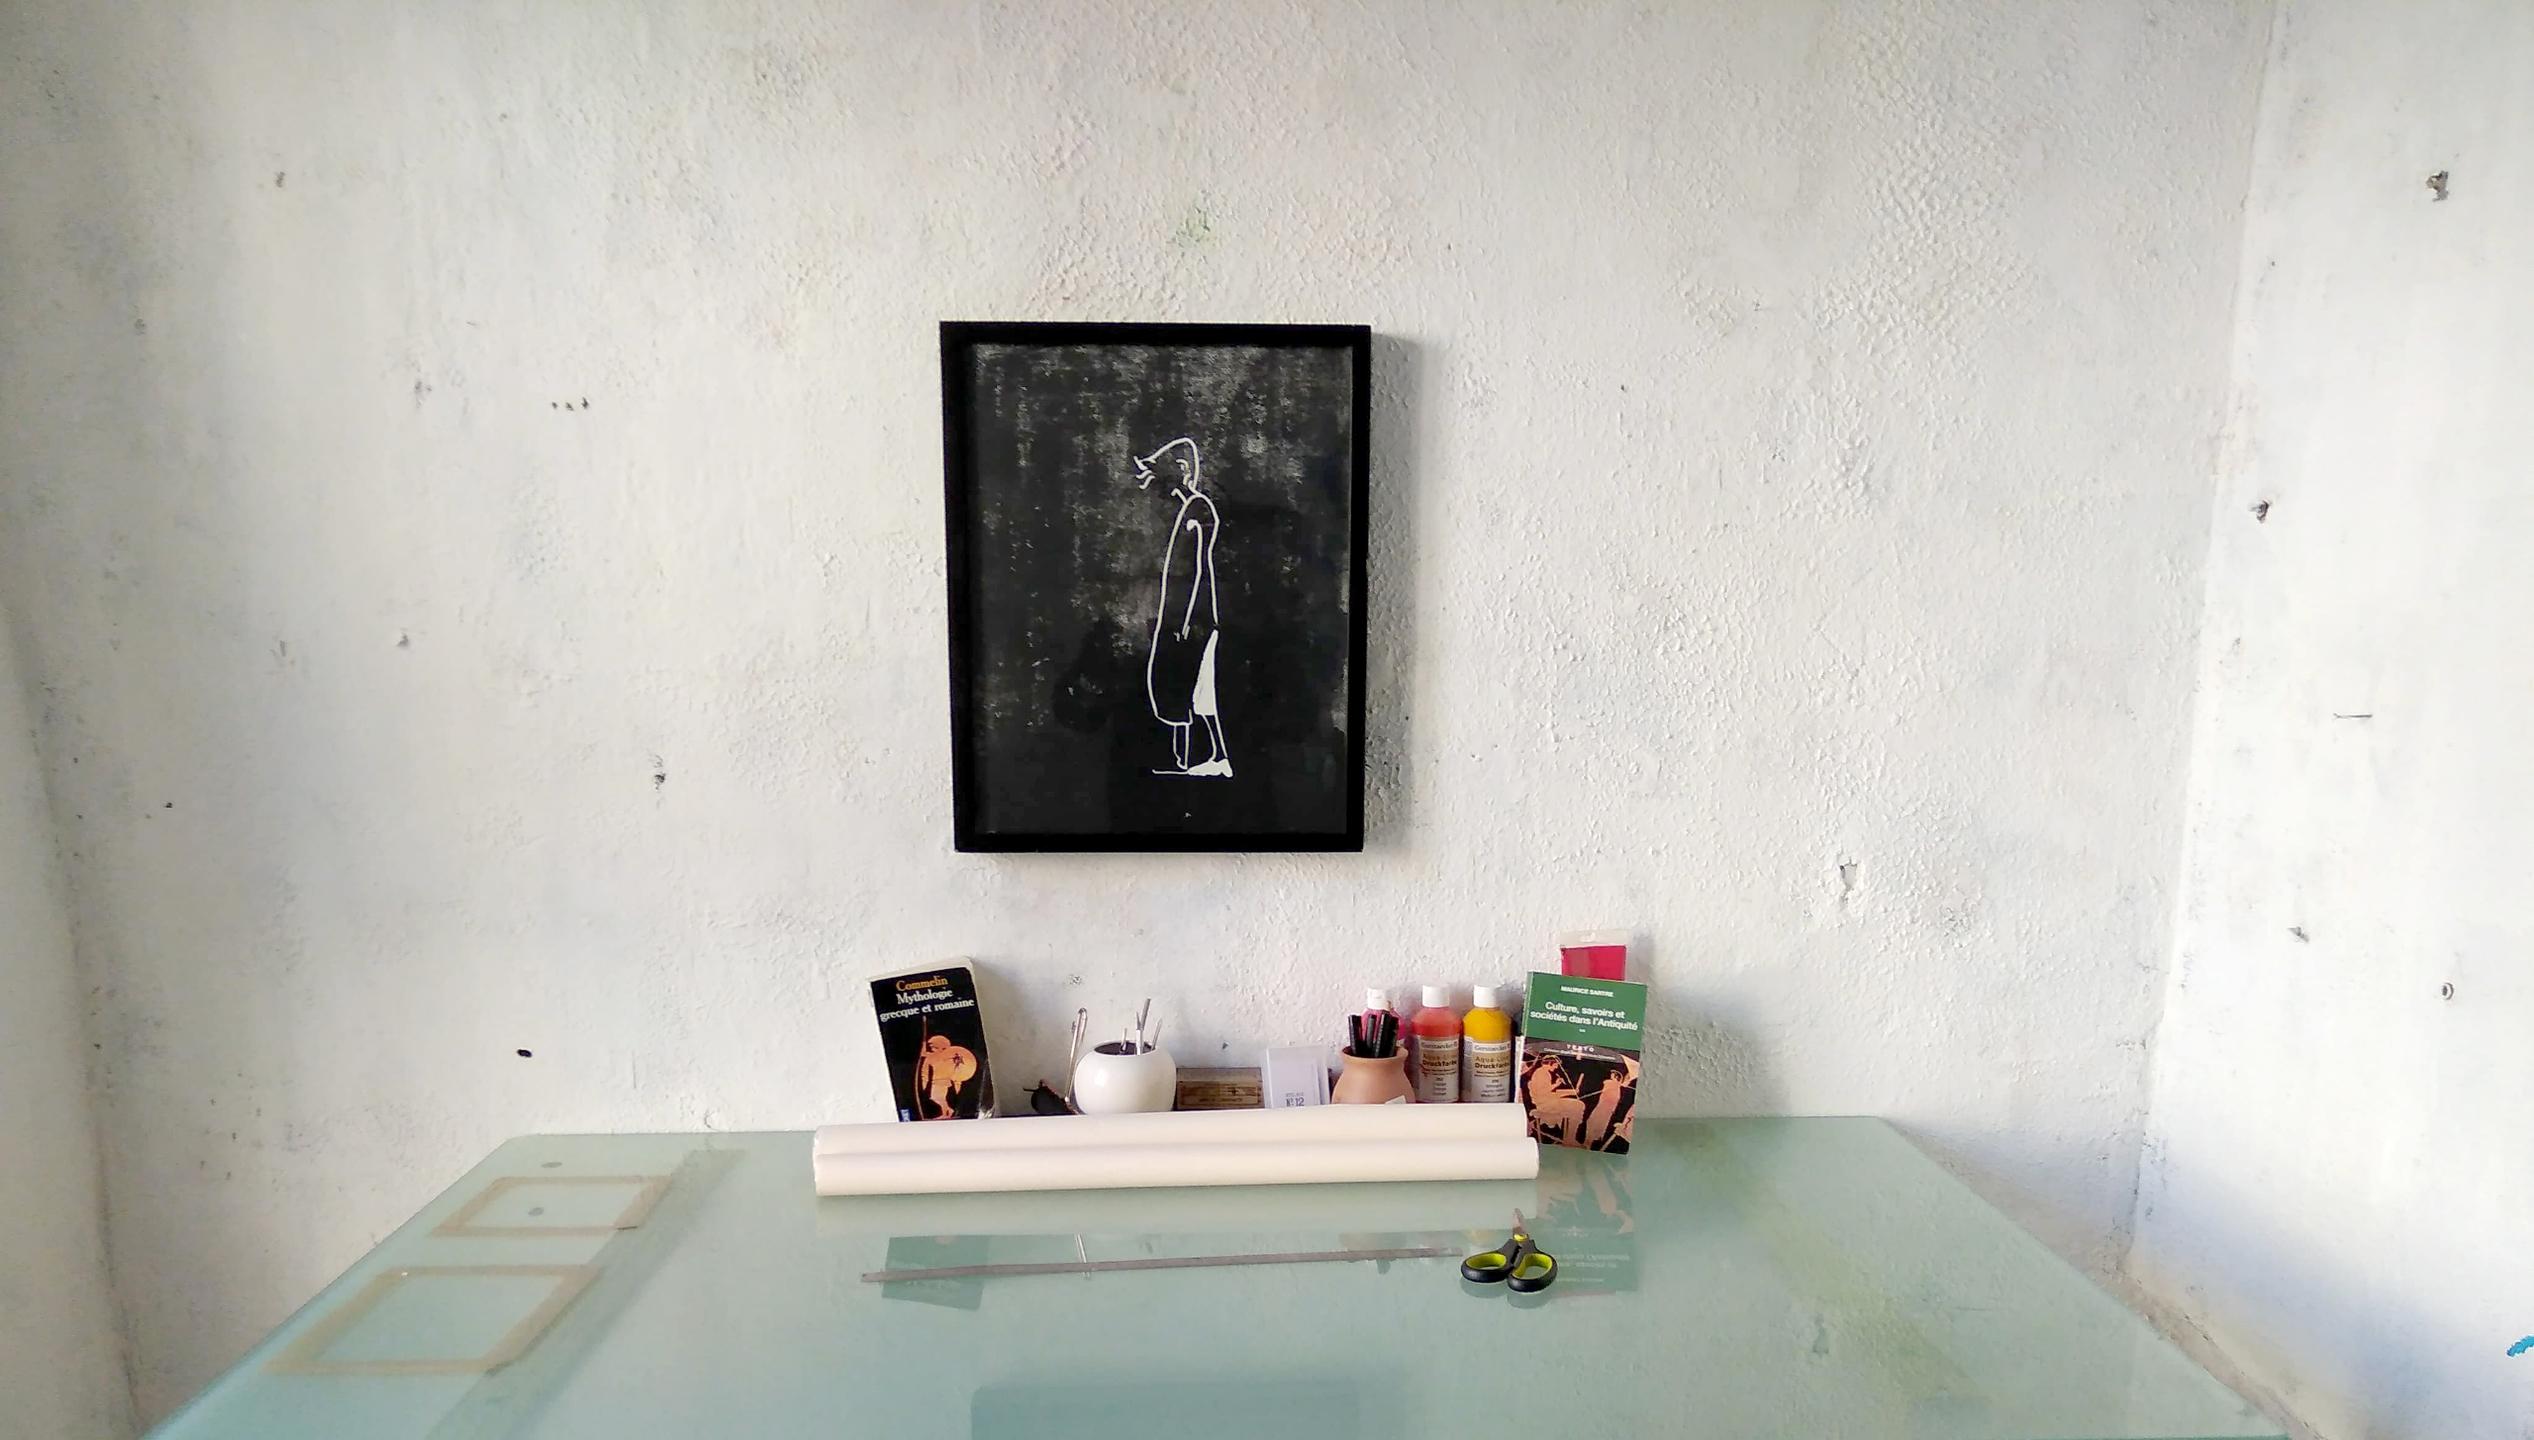 atelier 12 (@ateliernumero12) Cover Image